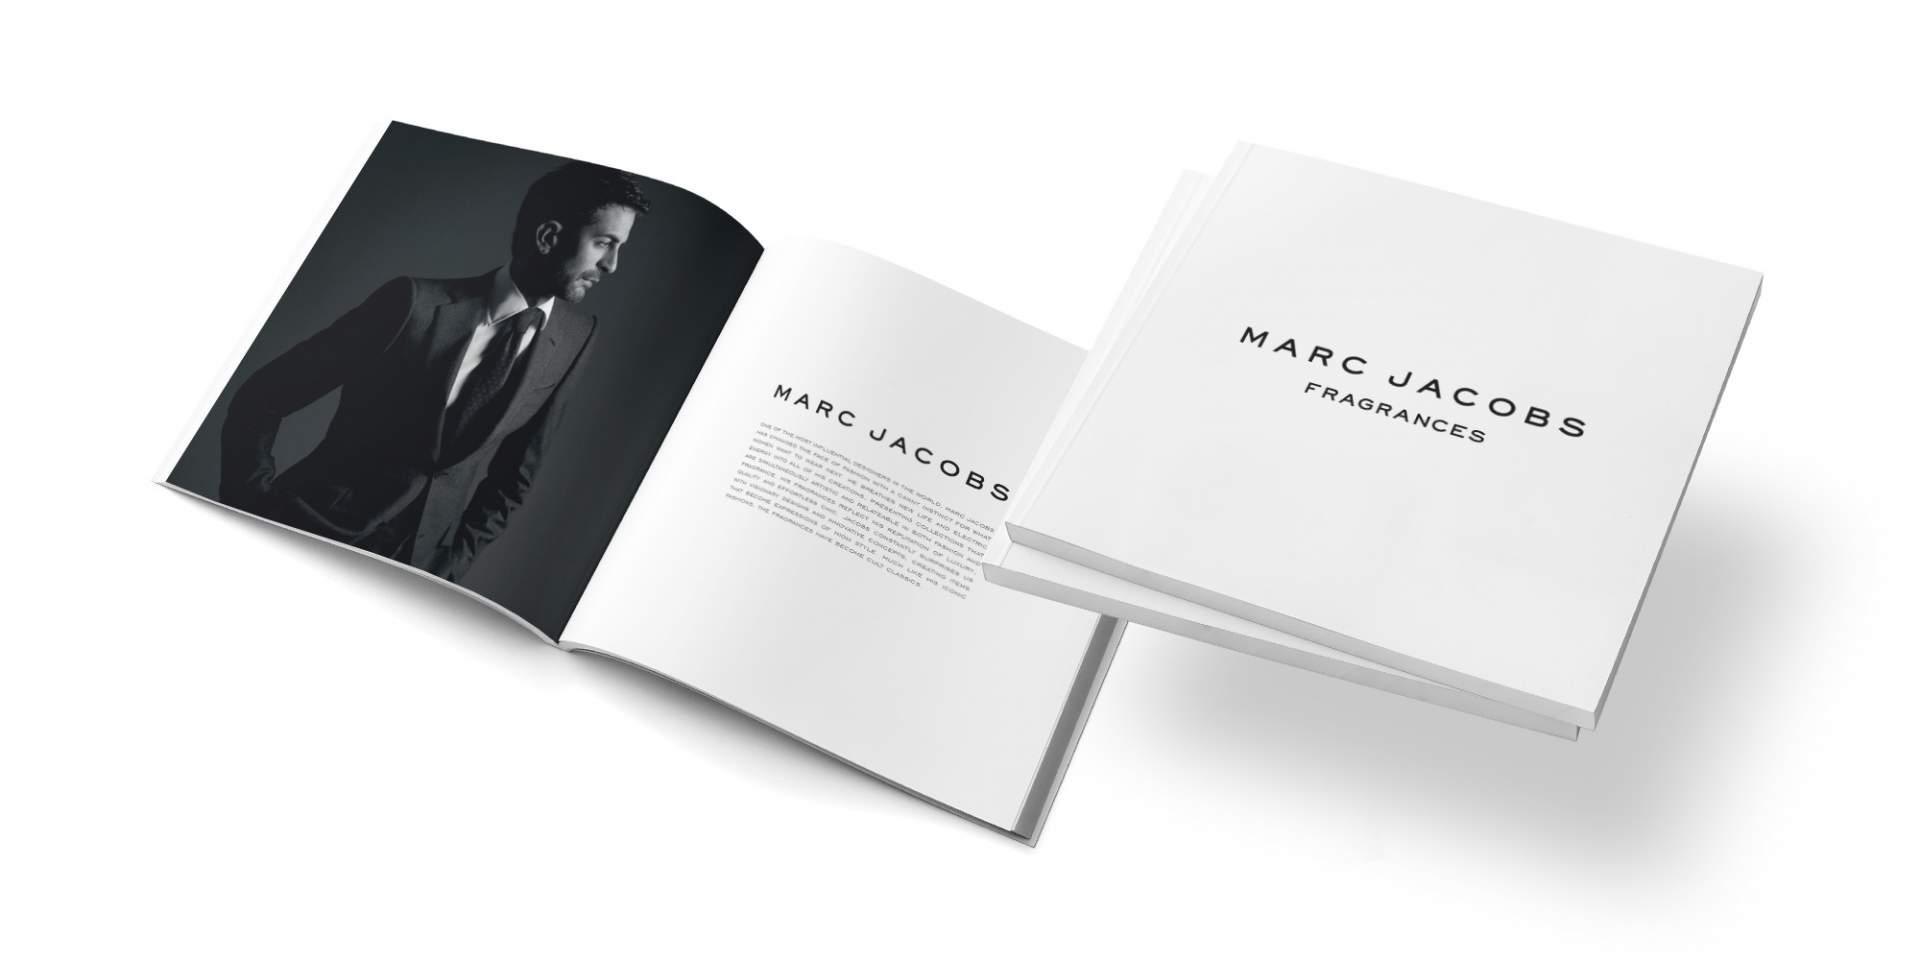 01-DA2 AGENCY - Marc Jacobs 01